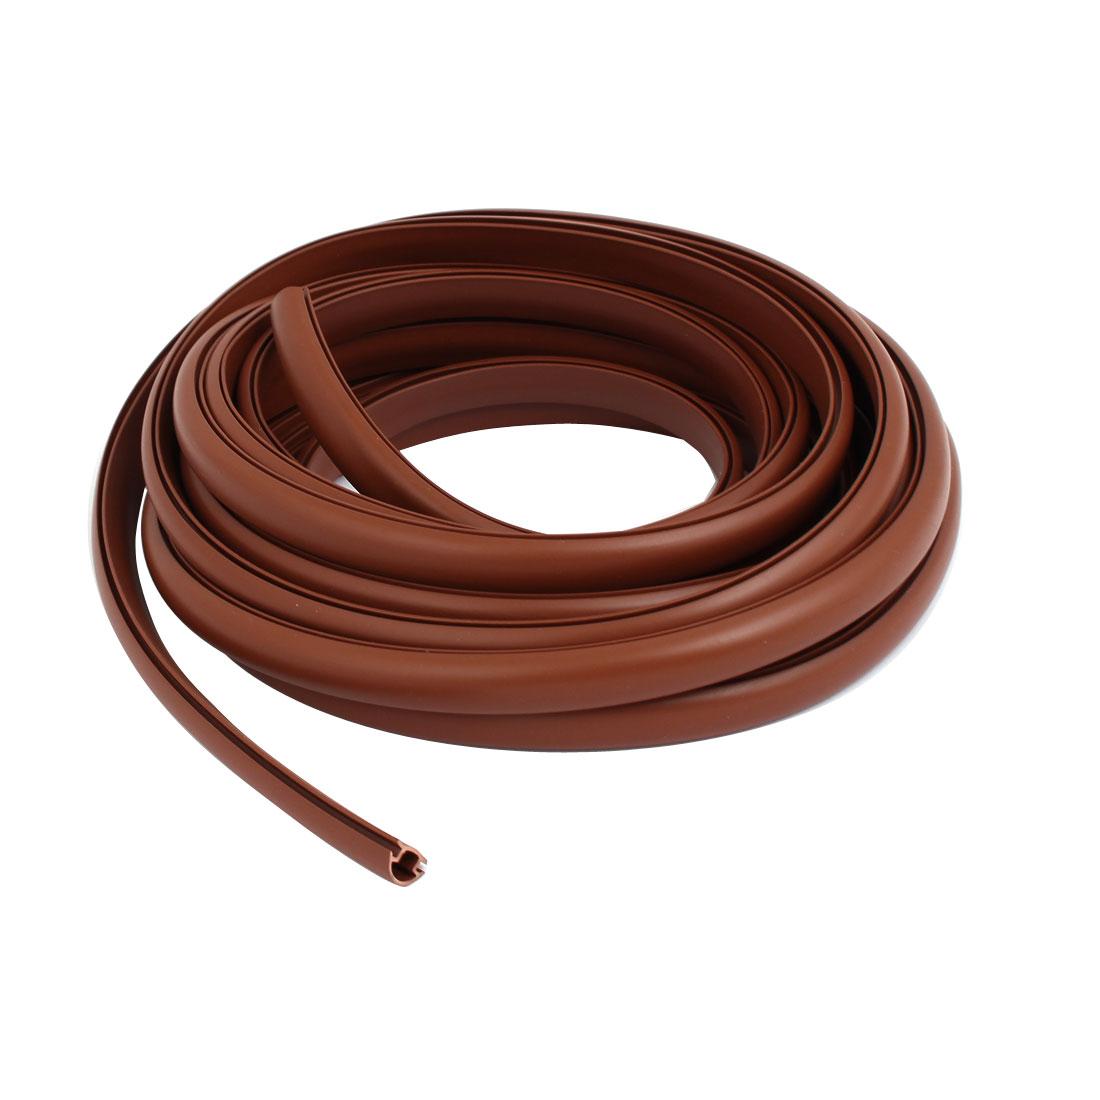 13.5mm Width 5M Length PVC Slot Type Door Seal Weather Strip Brown